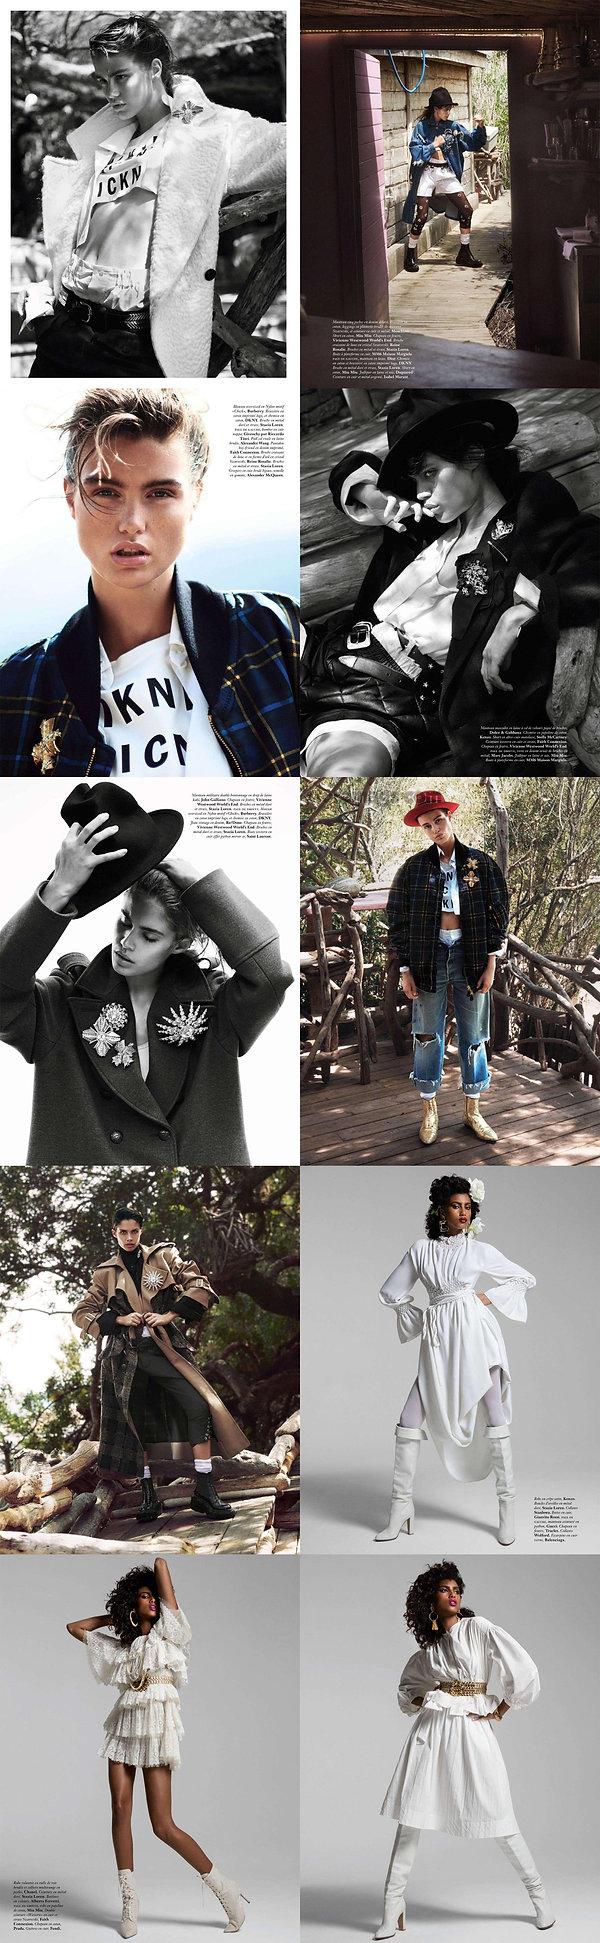 Vogue_Paris_October_2016.jpg